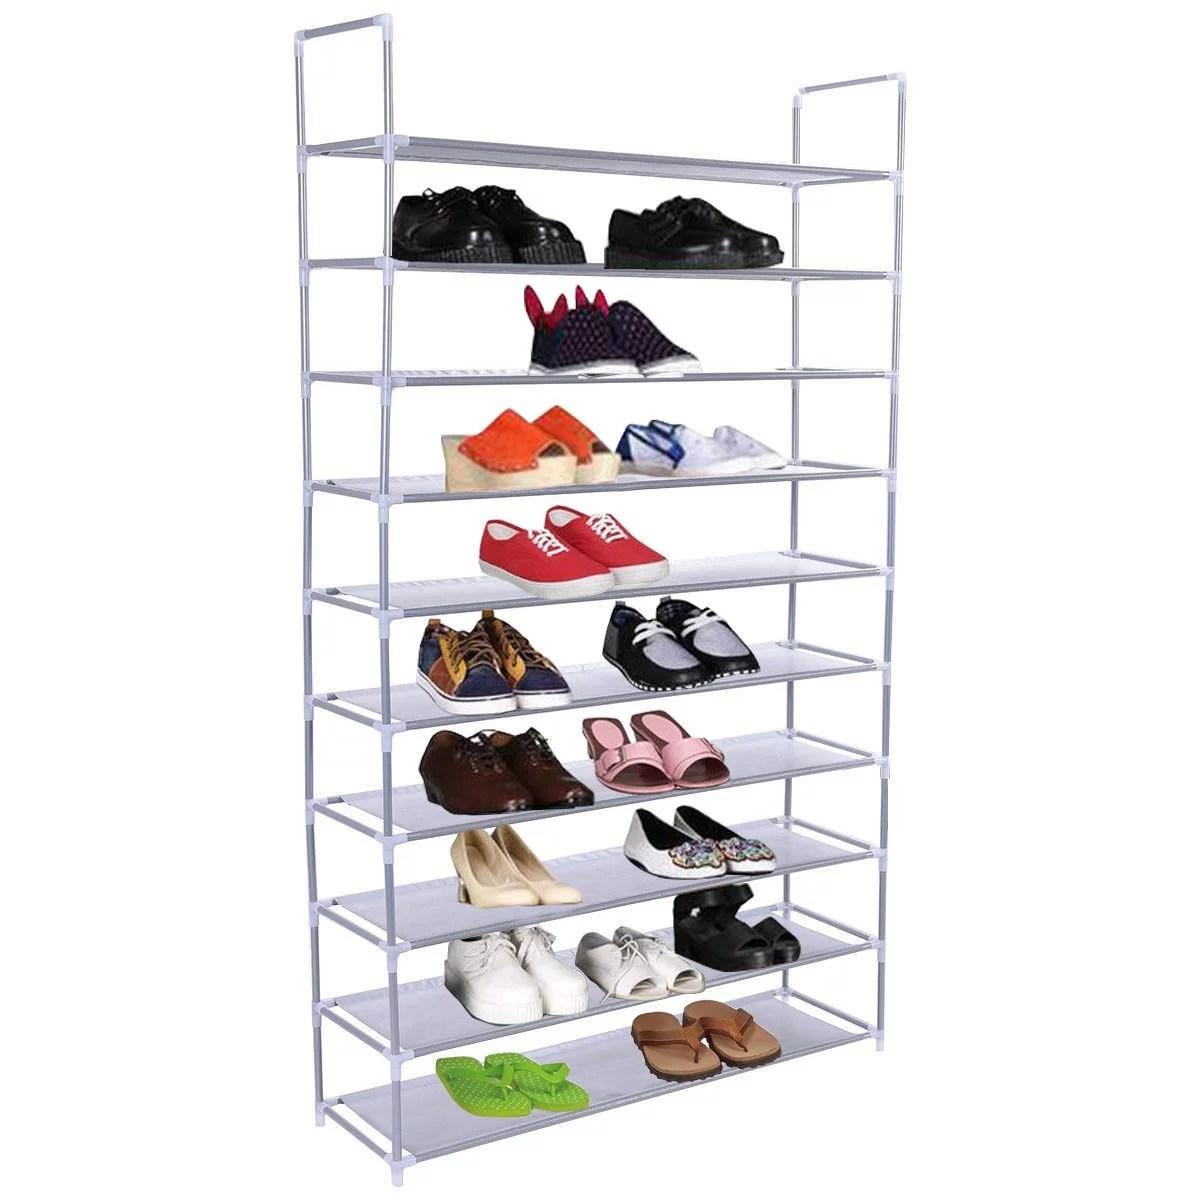 50 pair 10 tire shoe rack shelf home storage organizer closet cabinet portable